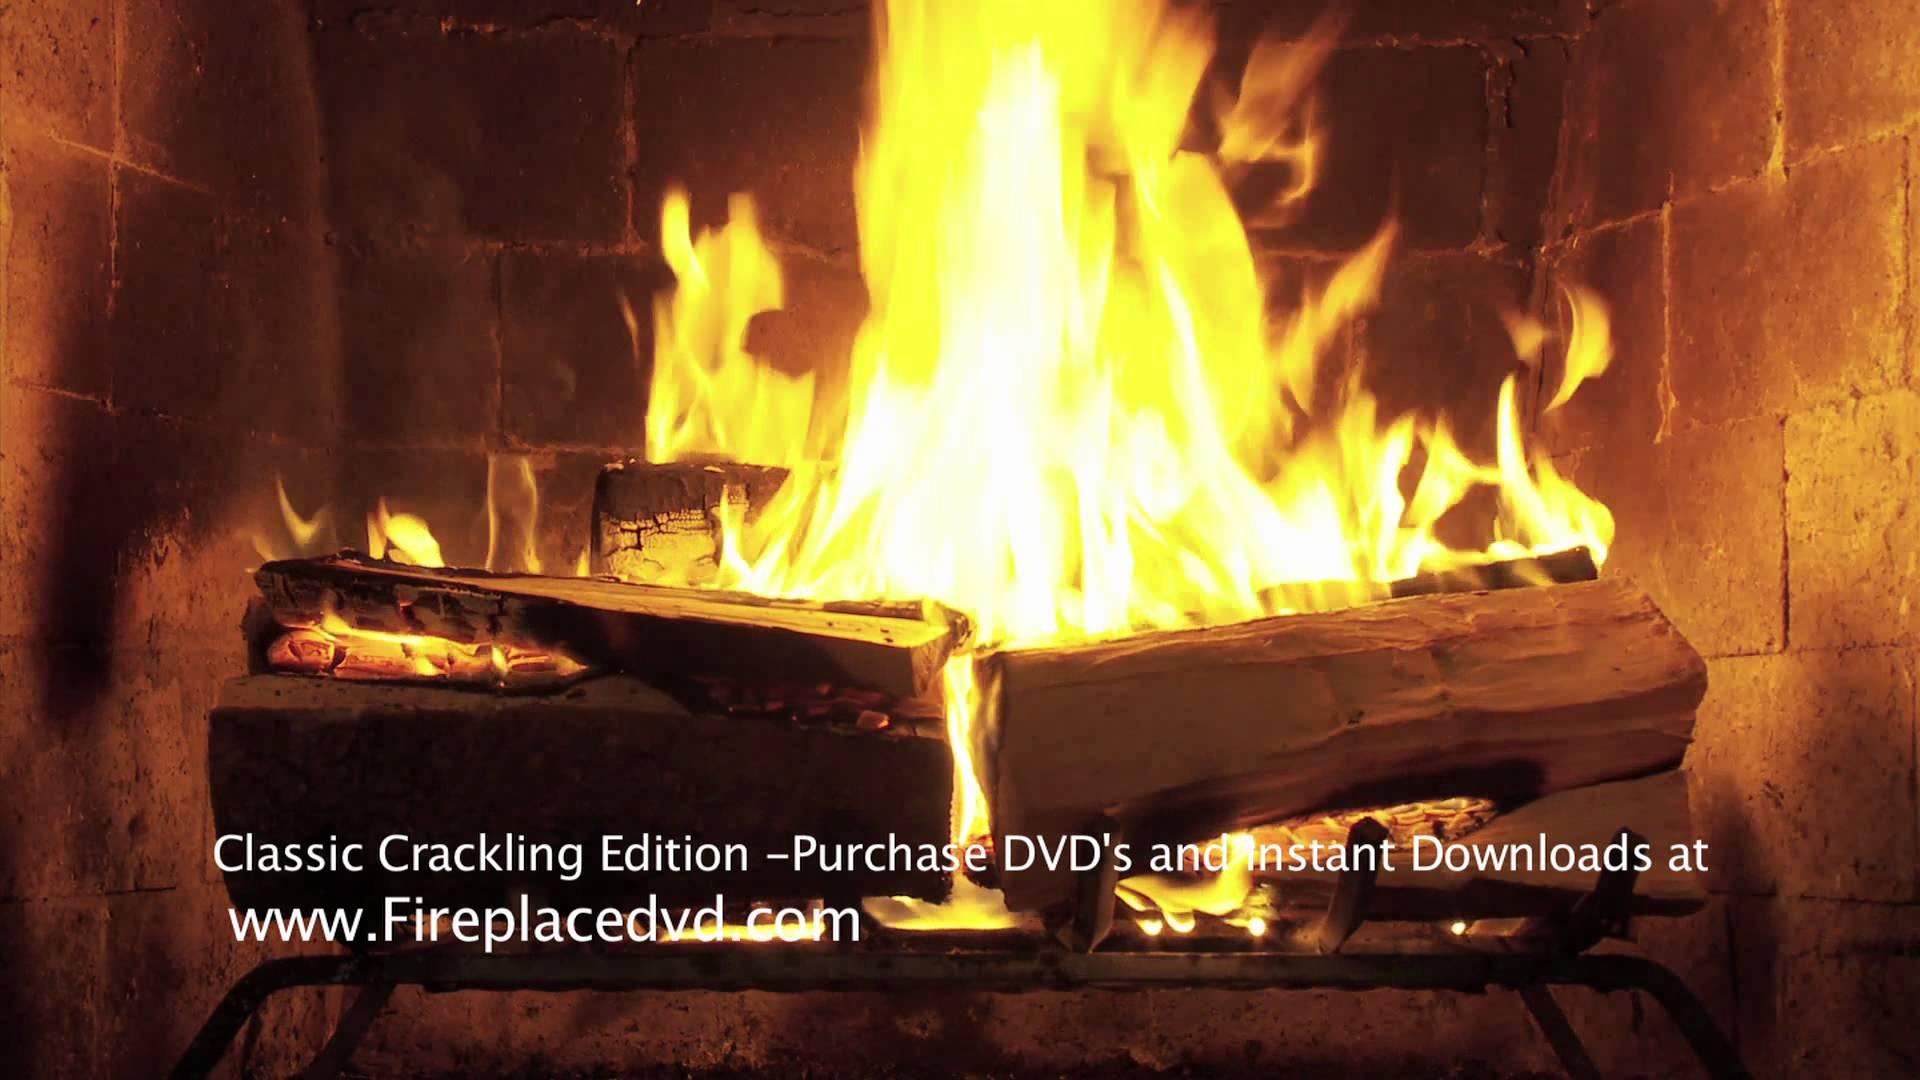 Fireplace Crackling Yule Log in HD 1080P 1920x1080